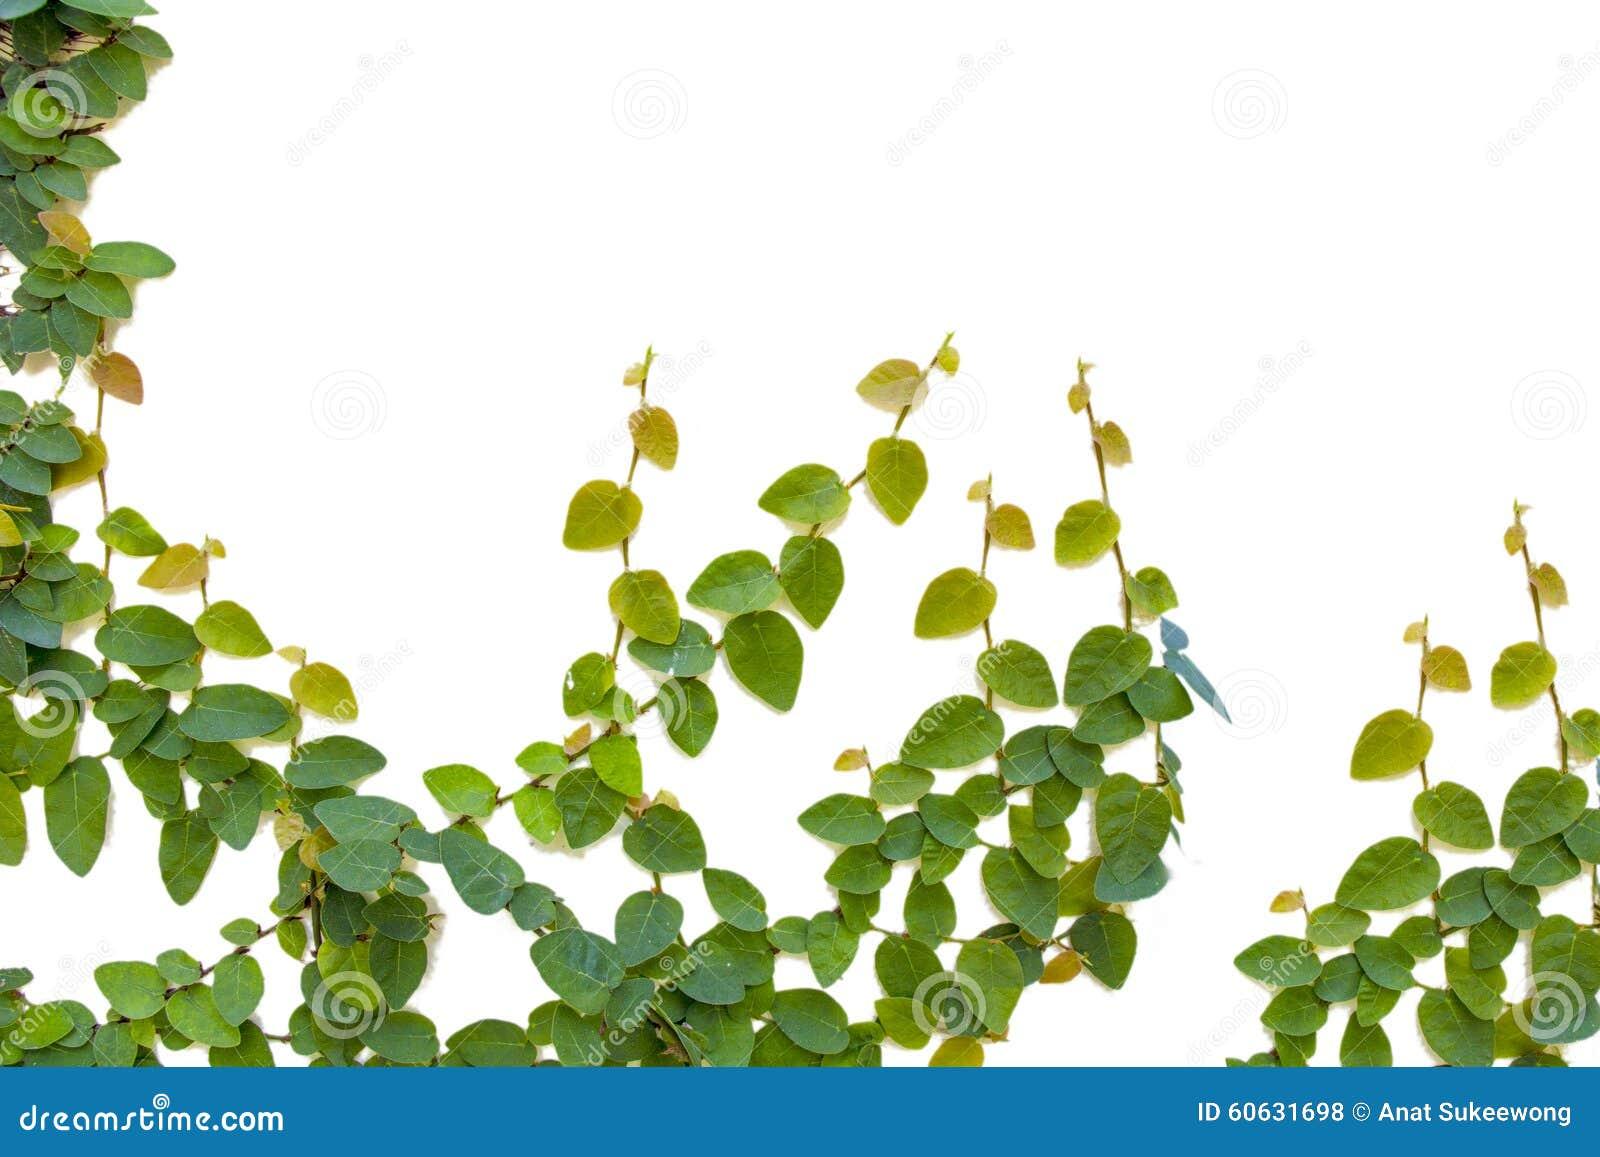 Ficus pumila climbing